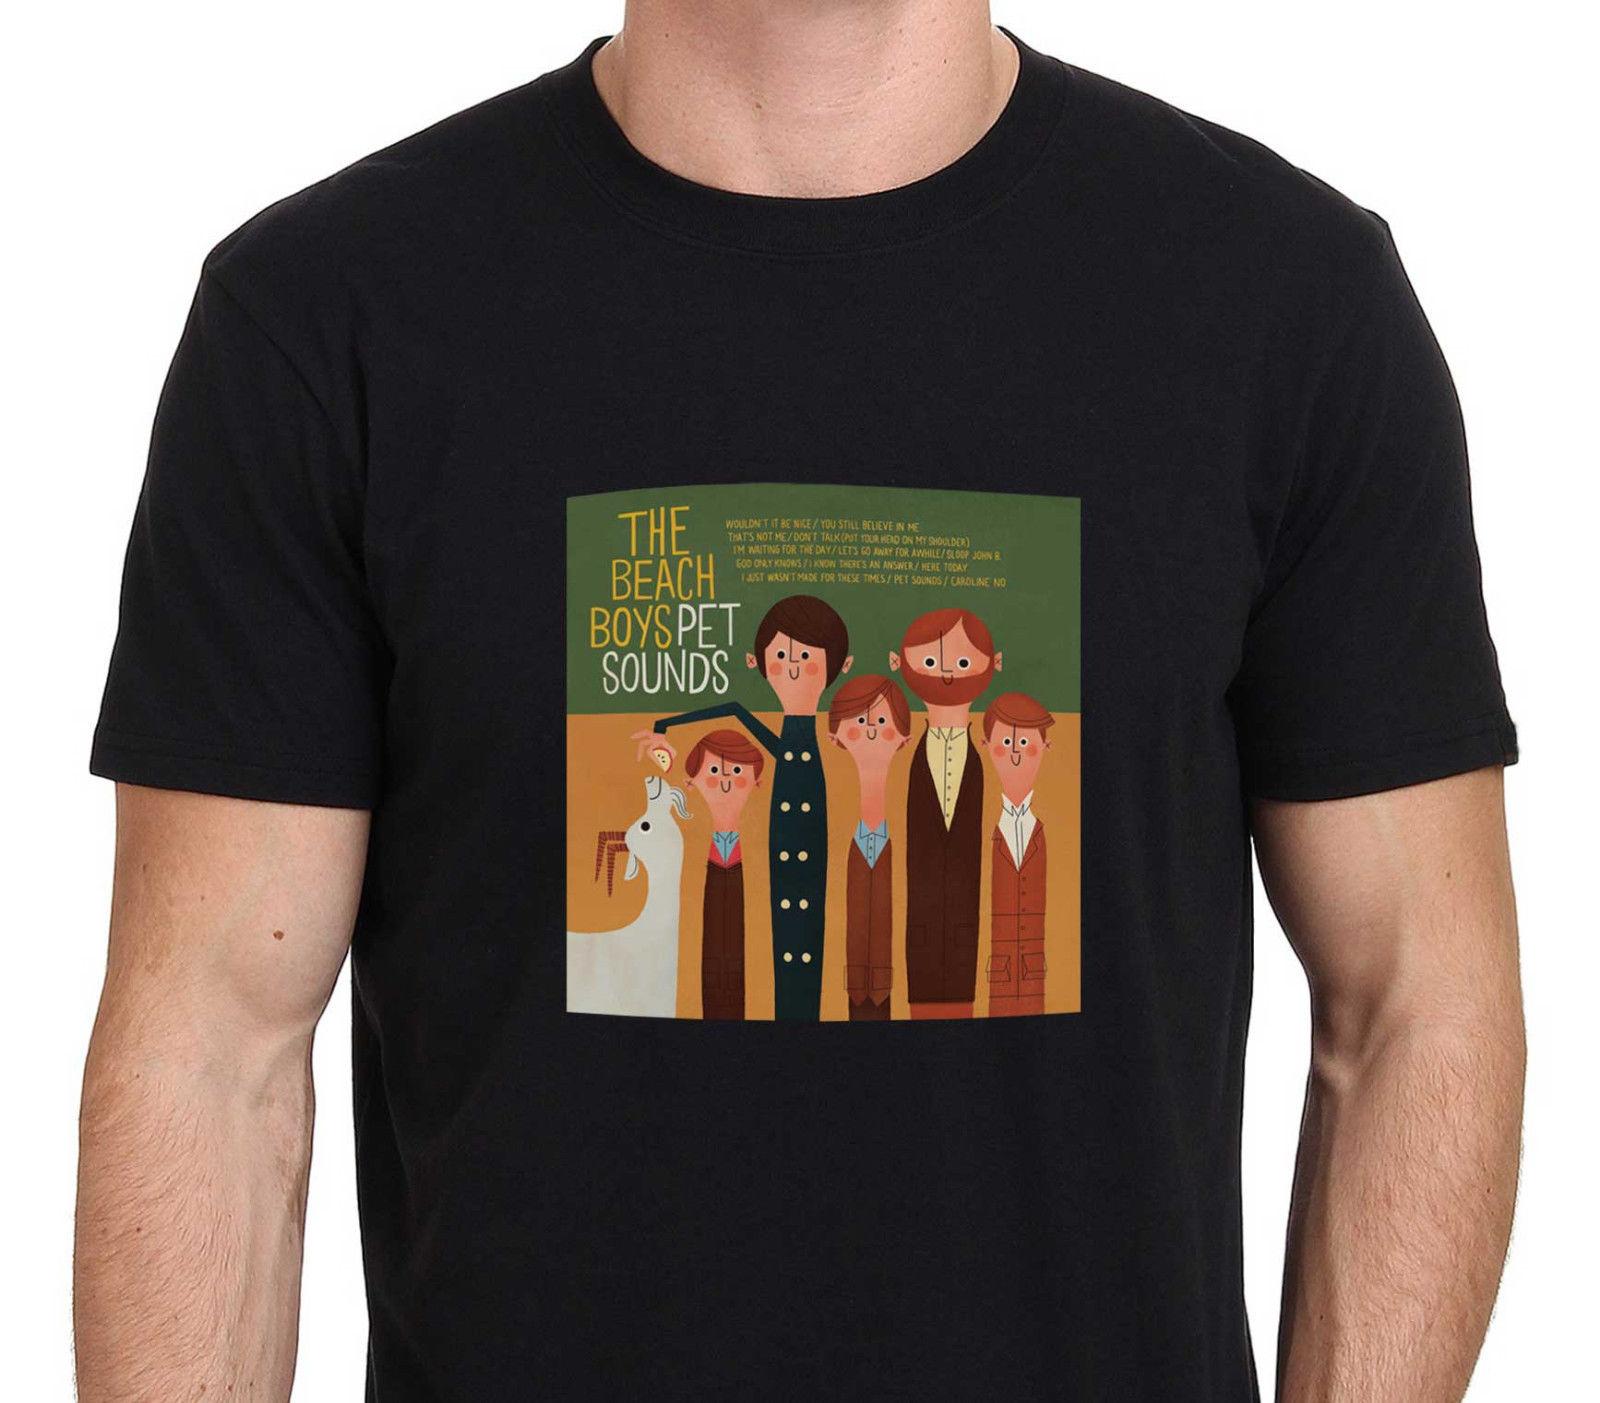 New 2017 Men'S Fashion The Beach Boys Pet Sounds Printed T Shirt Men Boy Novelty Short Sleeve T Shirt Tops Fashion Tees